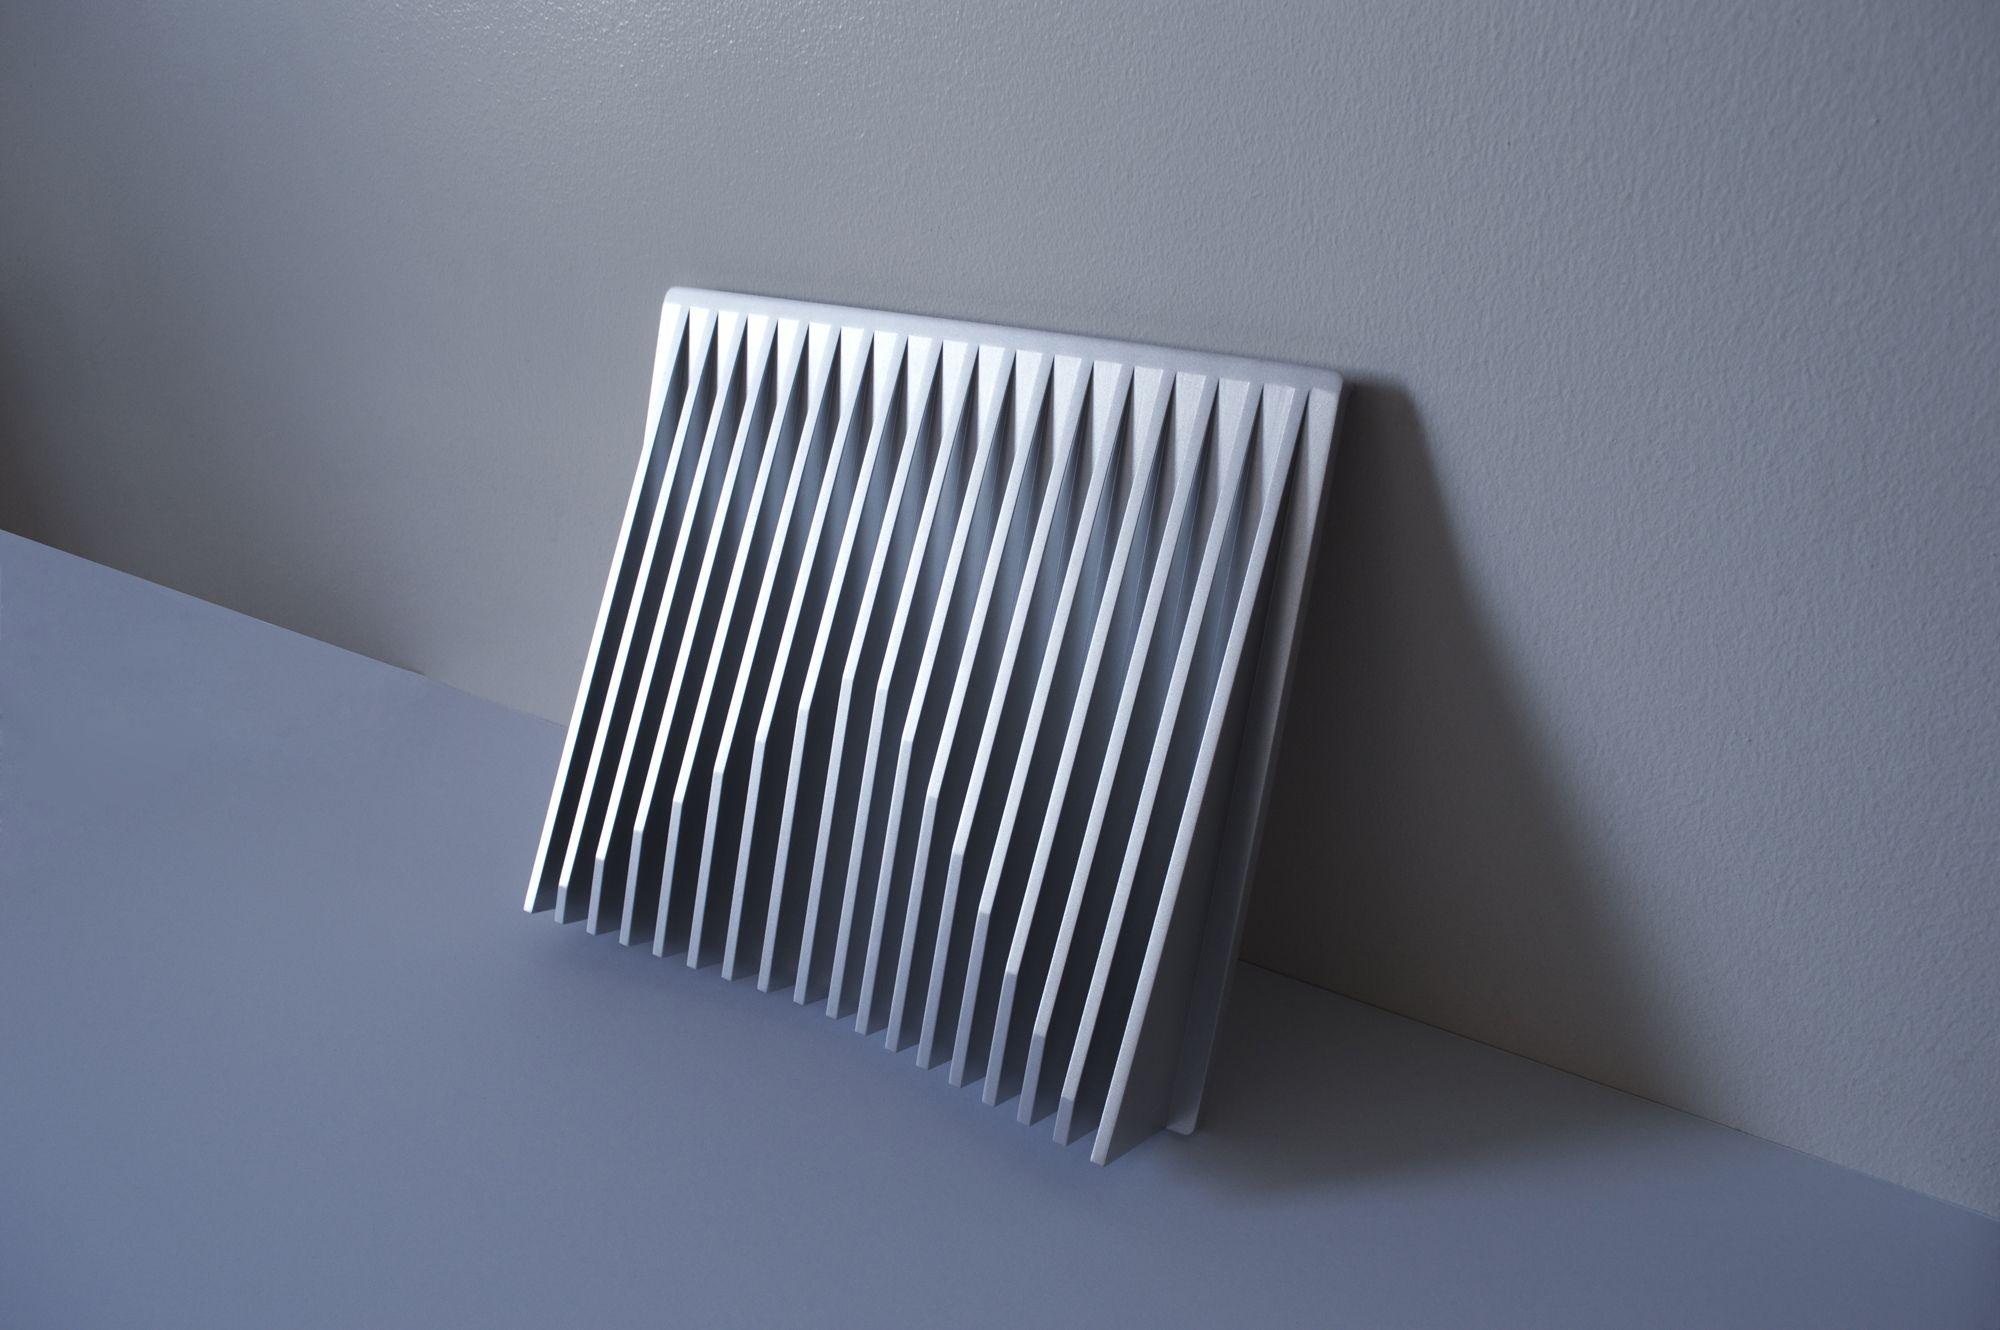 Aluminum Heatsink | Heatsink design, Stand design, Laptop